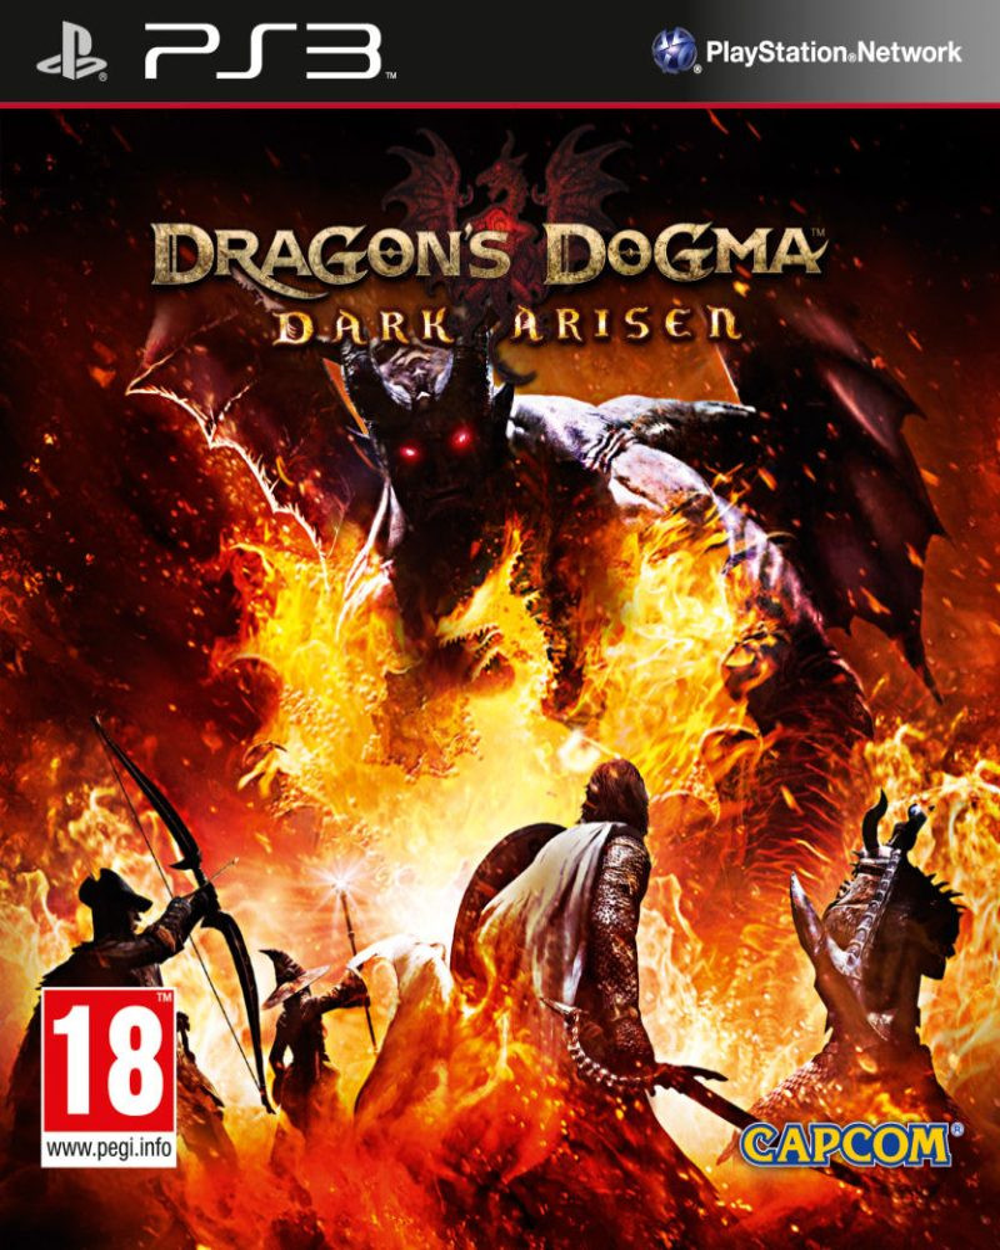 PS3 Dragons Dogma - Dark Arisen